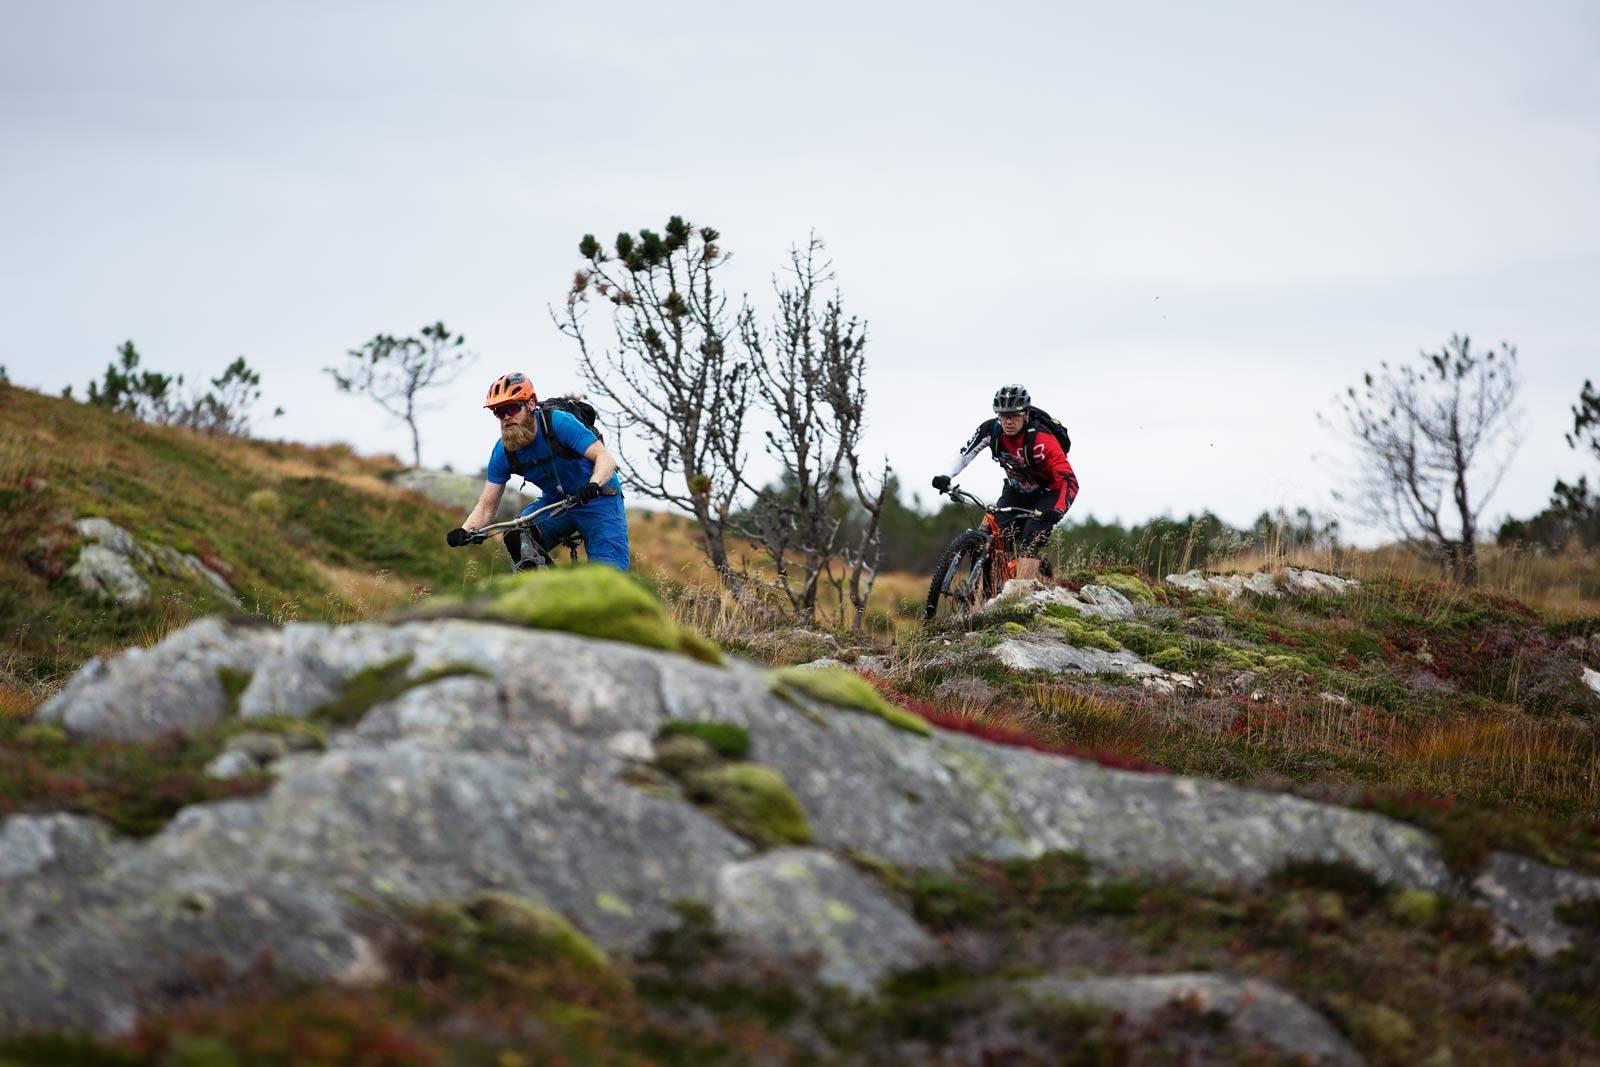 Stisykling-i-Bergen-2